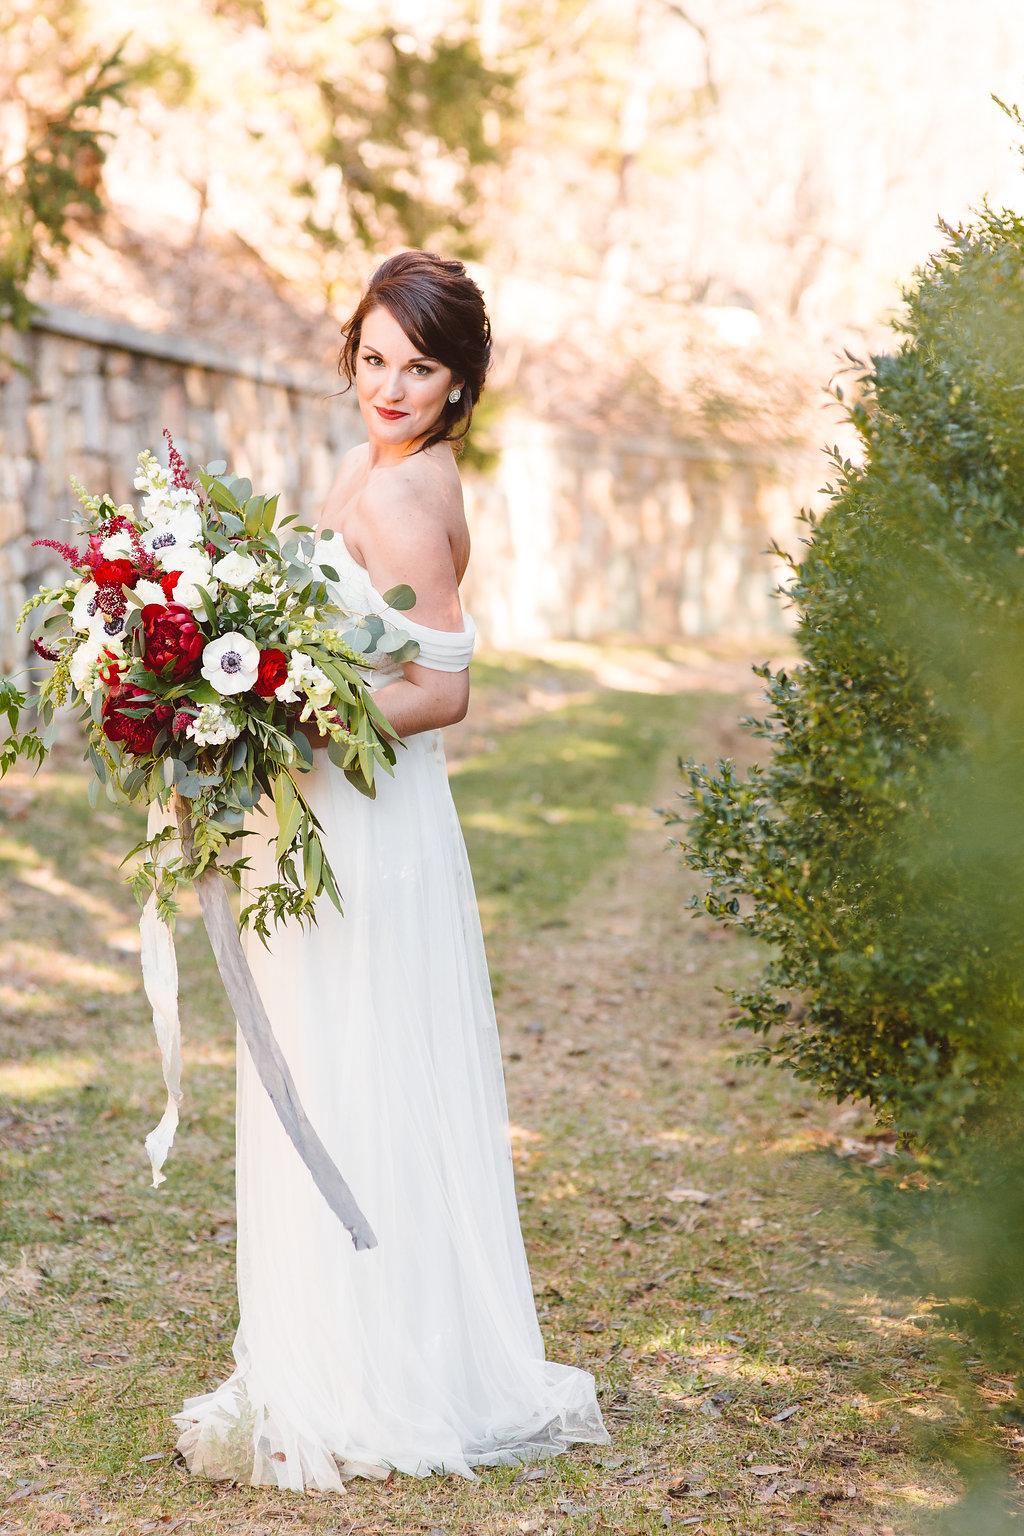 french-wedding-inspiration-255.jpg